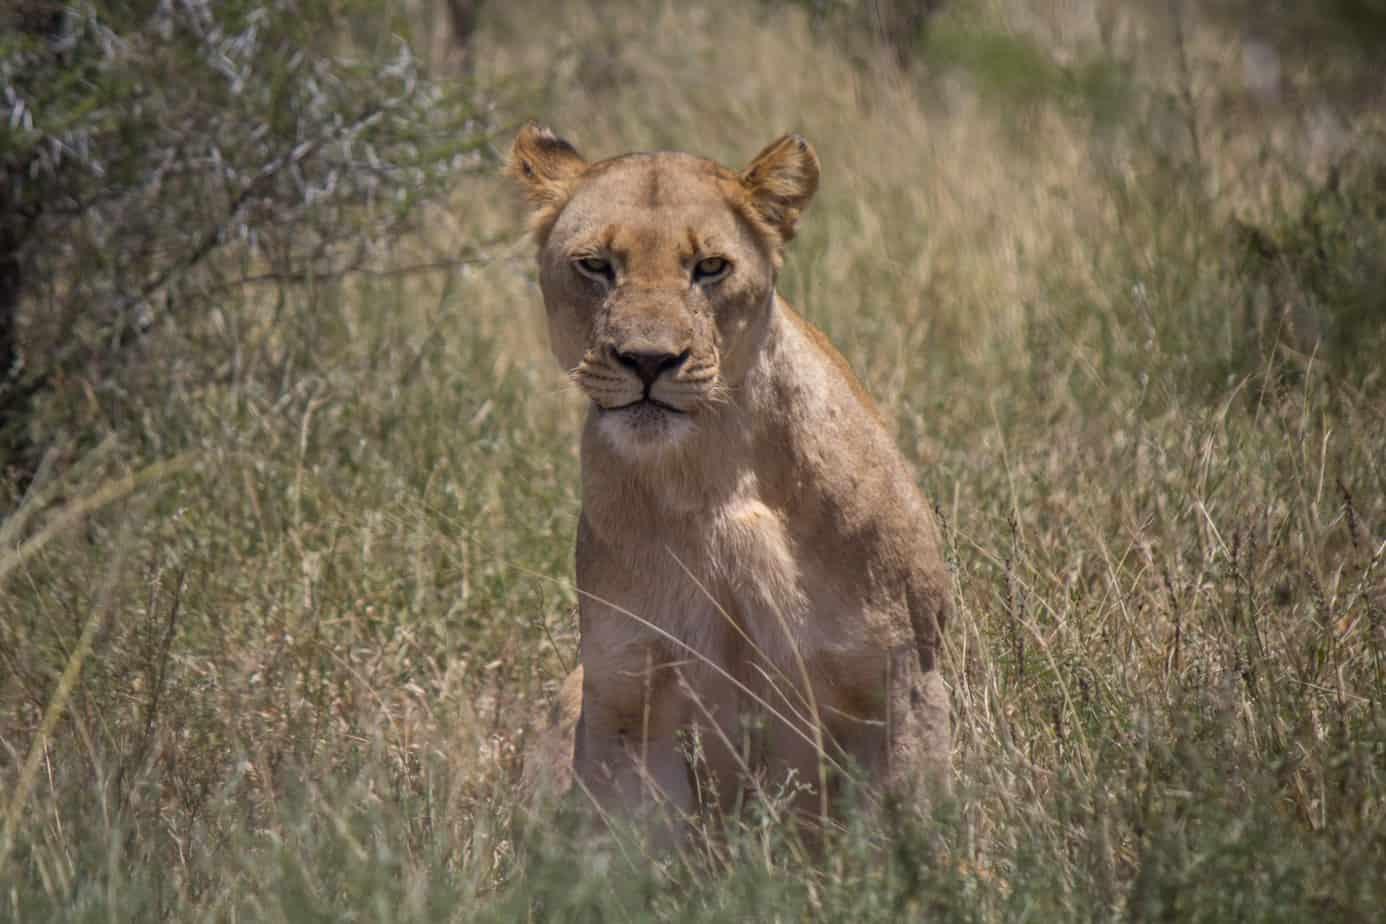 Lioness @ Hluhluwe-iMfolozi Park. Photo: Håvard Rosenlund